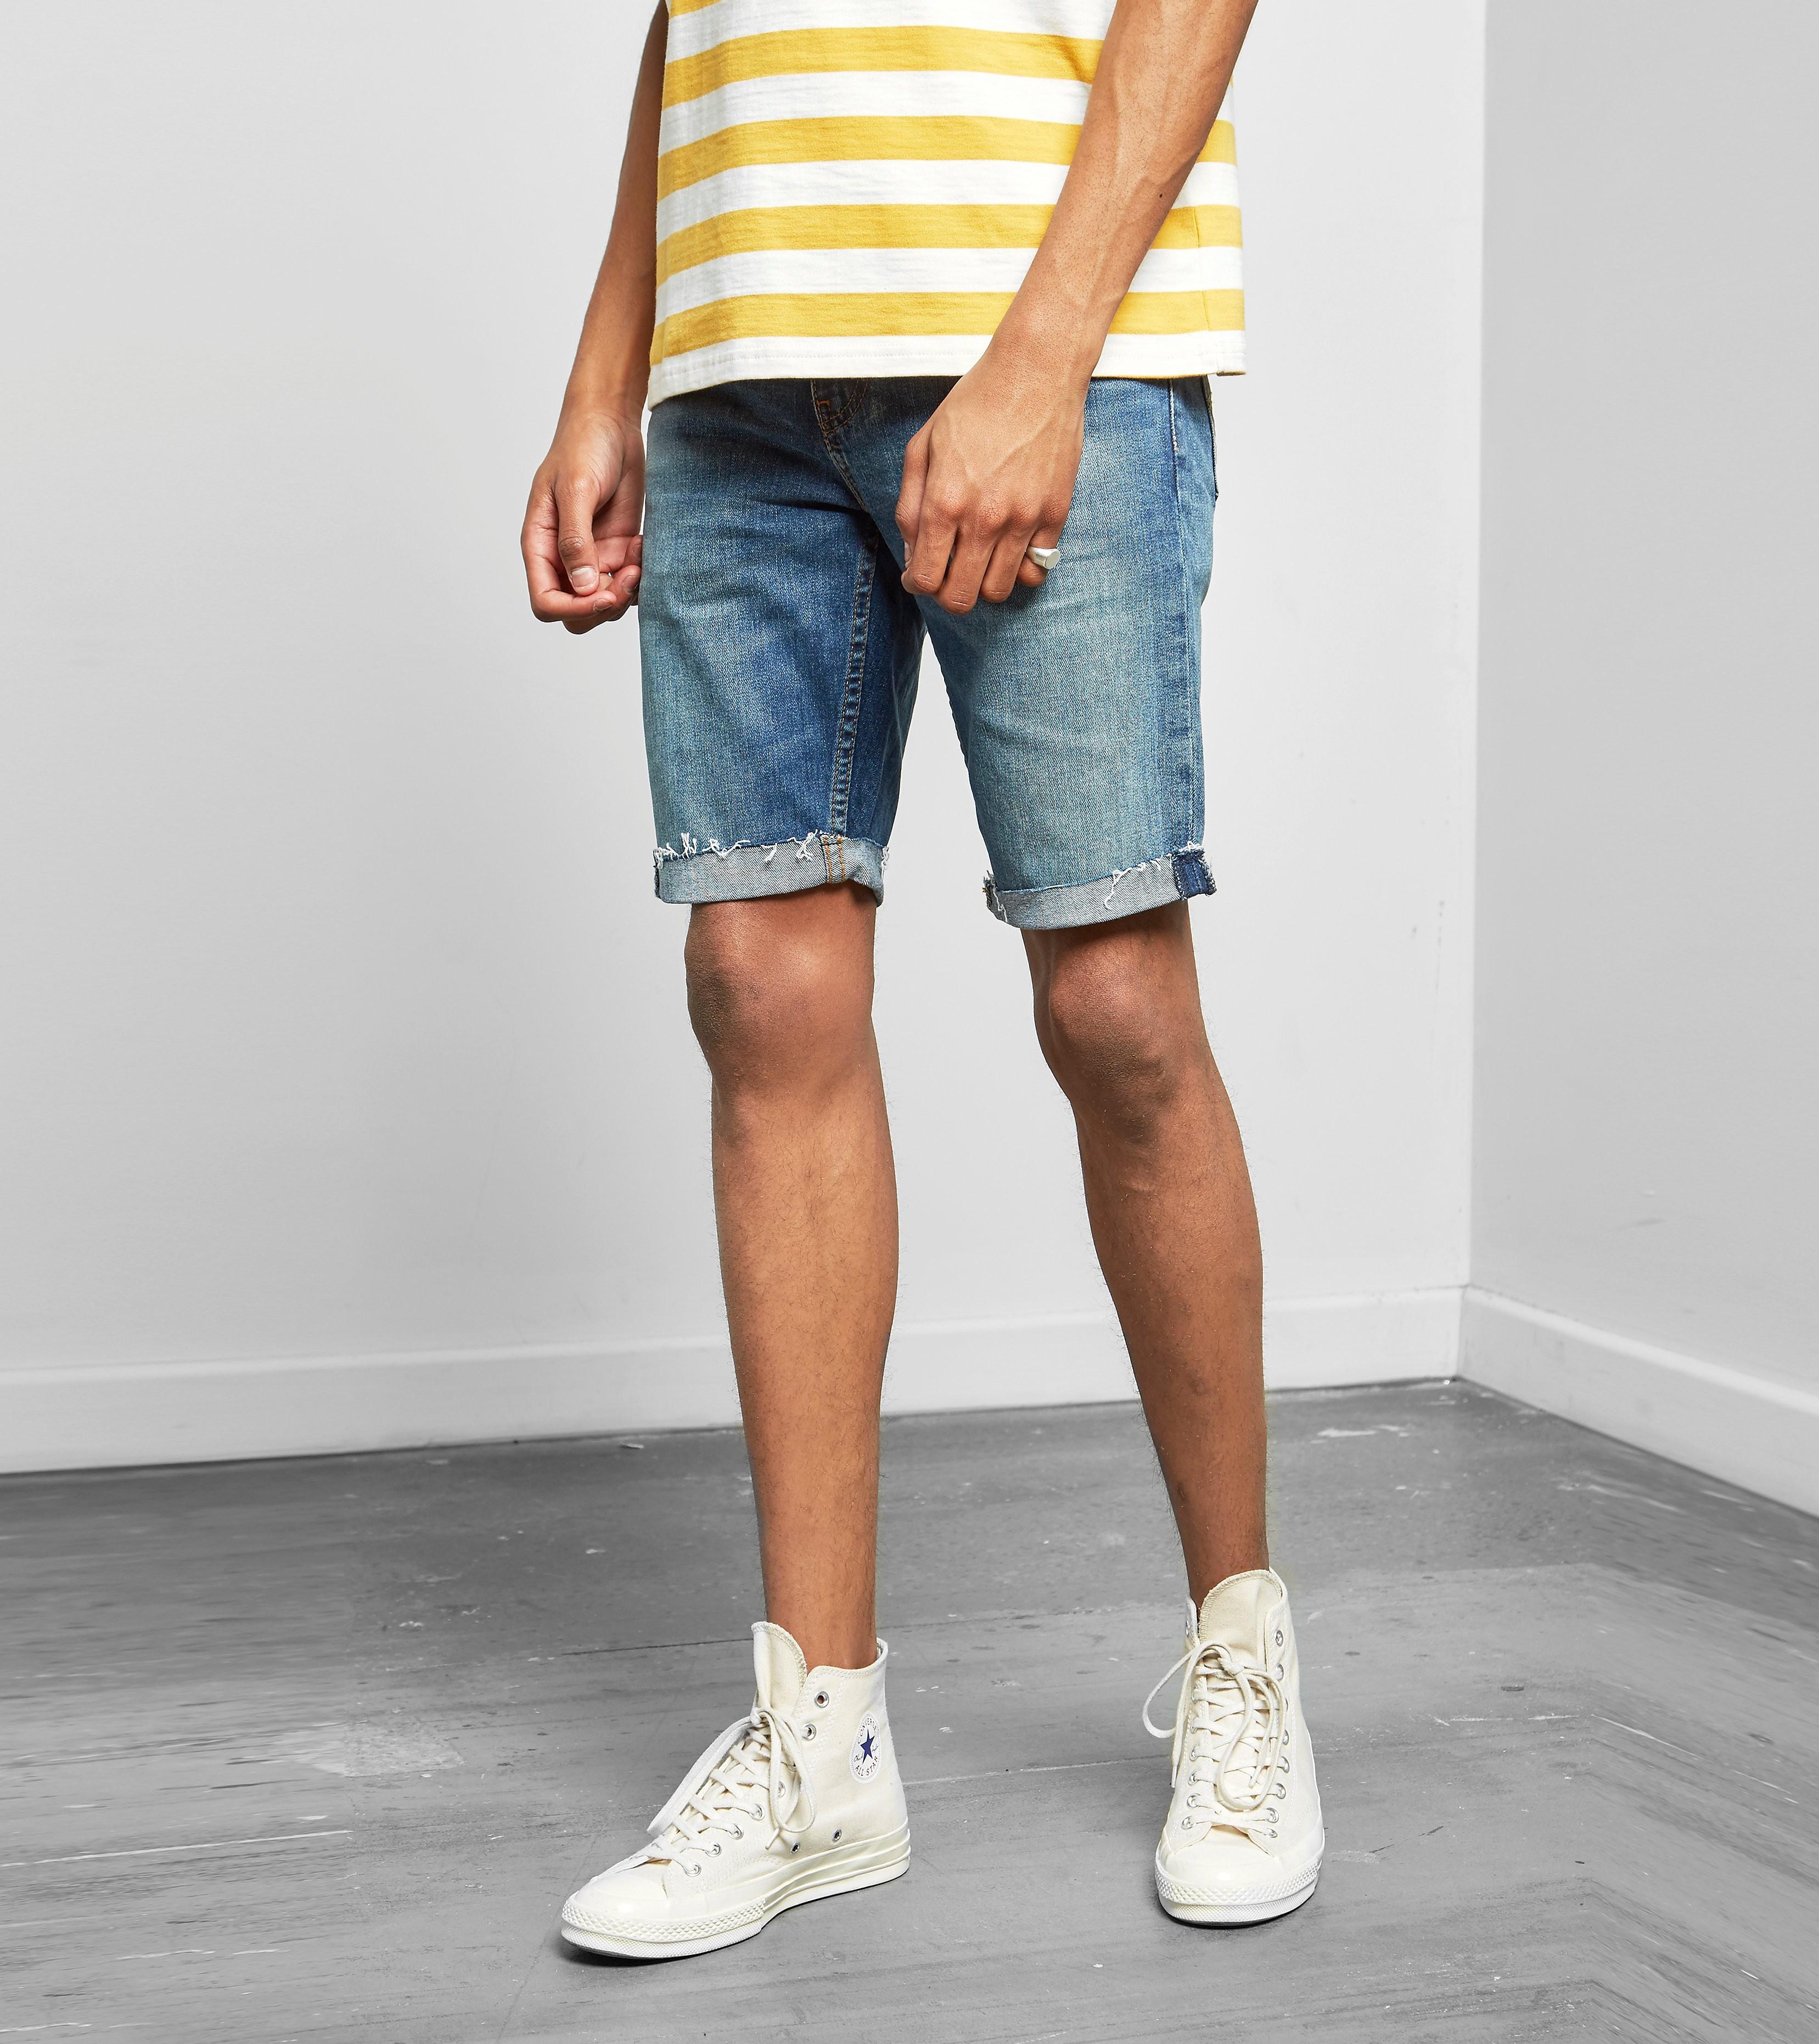 Levis 511 Slim Shorts